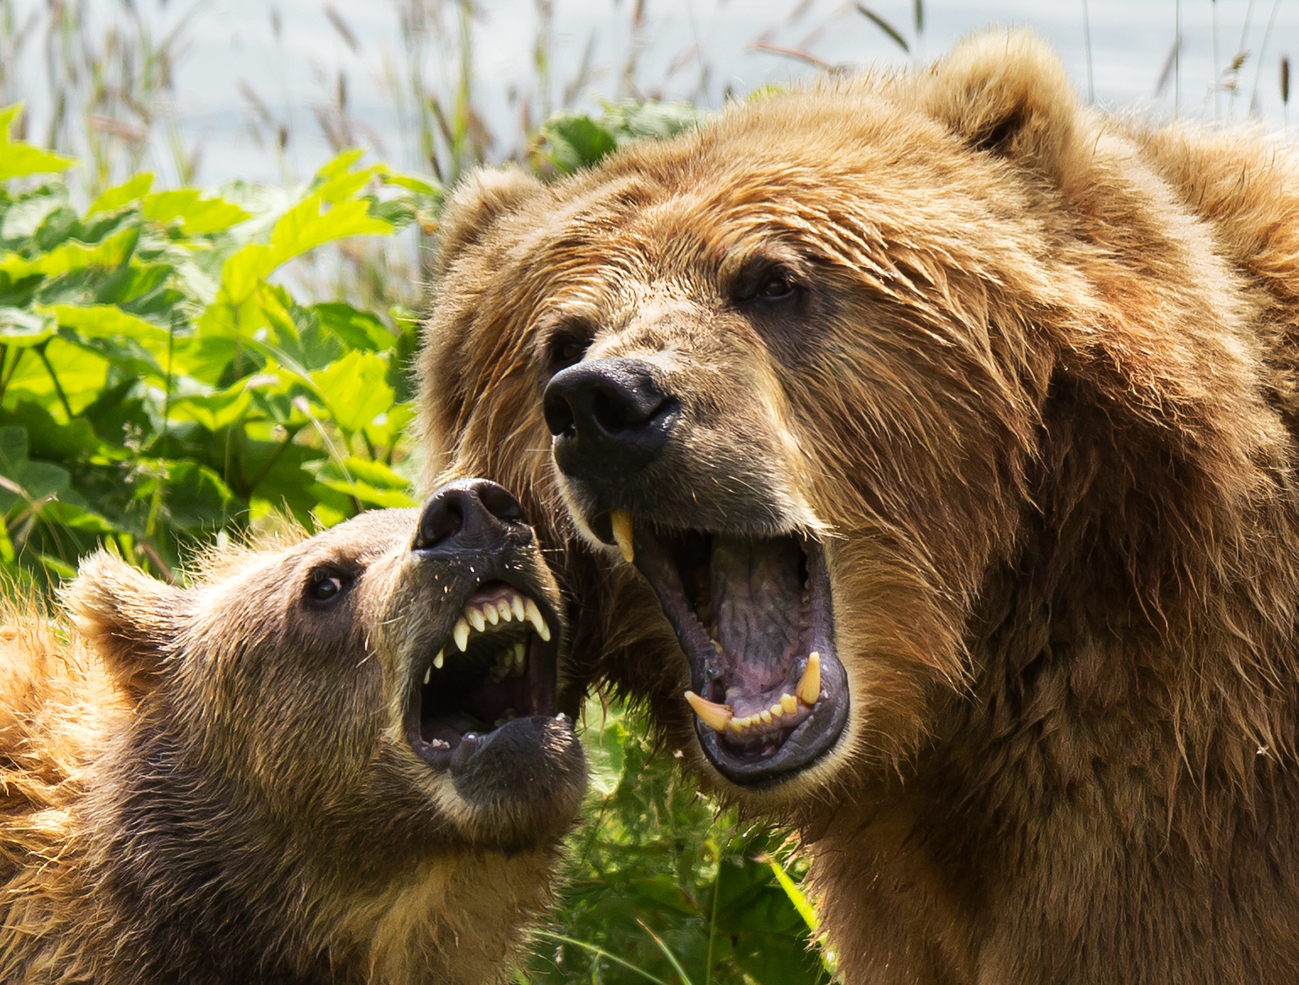 two Kodiak bears, showing teeth